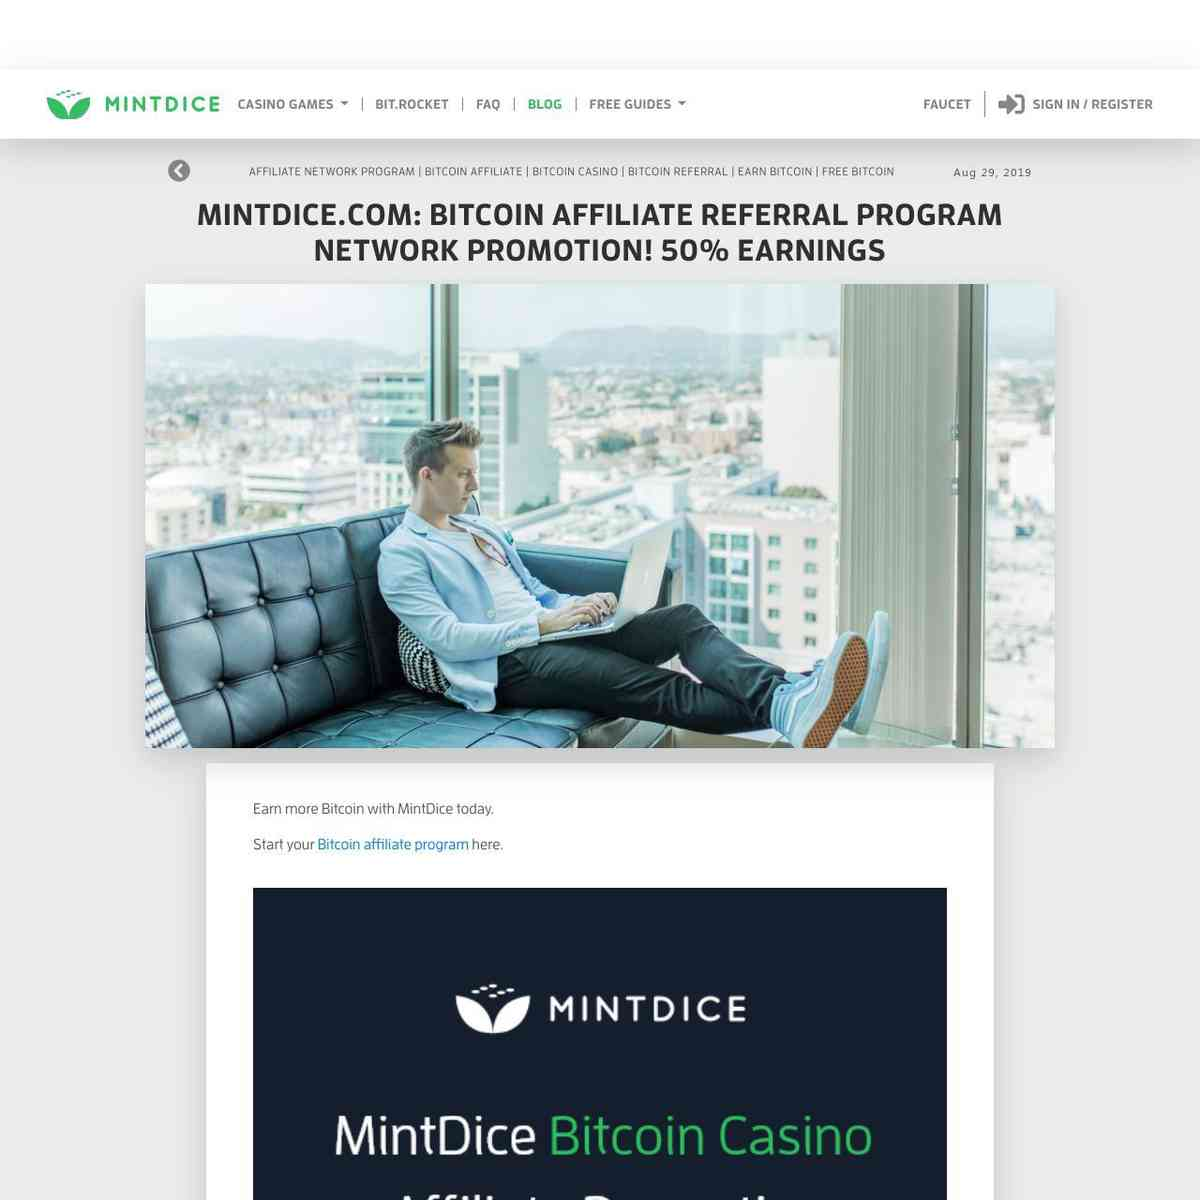 MintDice.com: Bitcoin Affiliate Referral Program Network PROMOTION! 50% Earnings